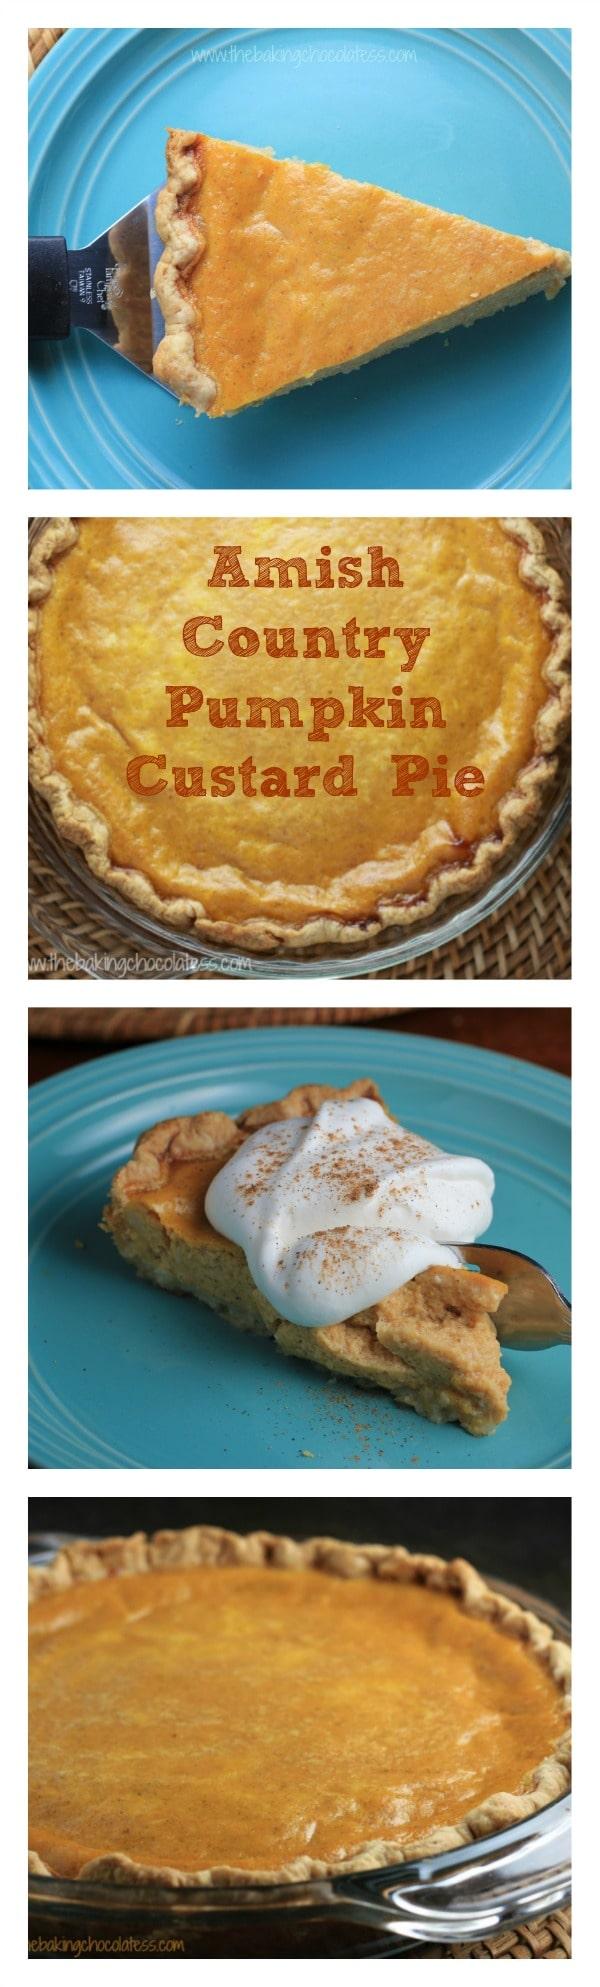 Amish Country Pumpkin Custard Pie